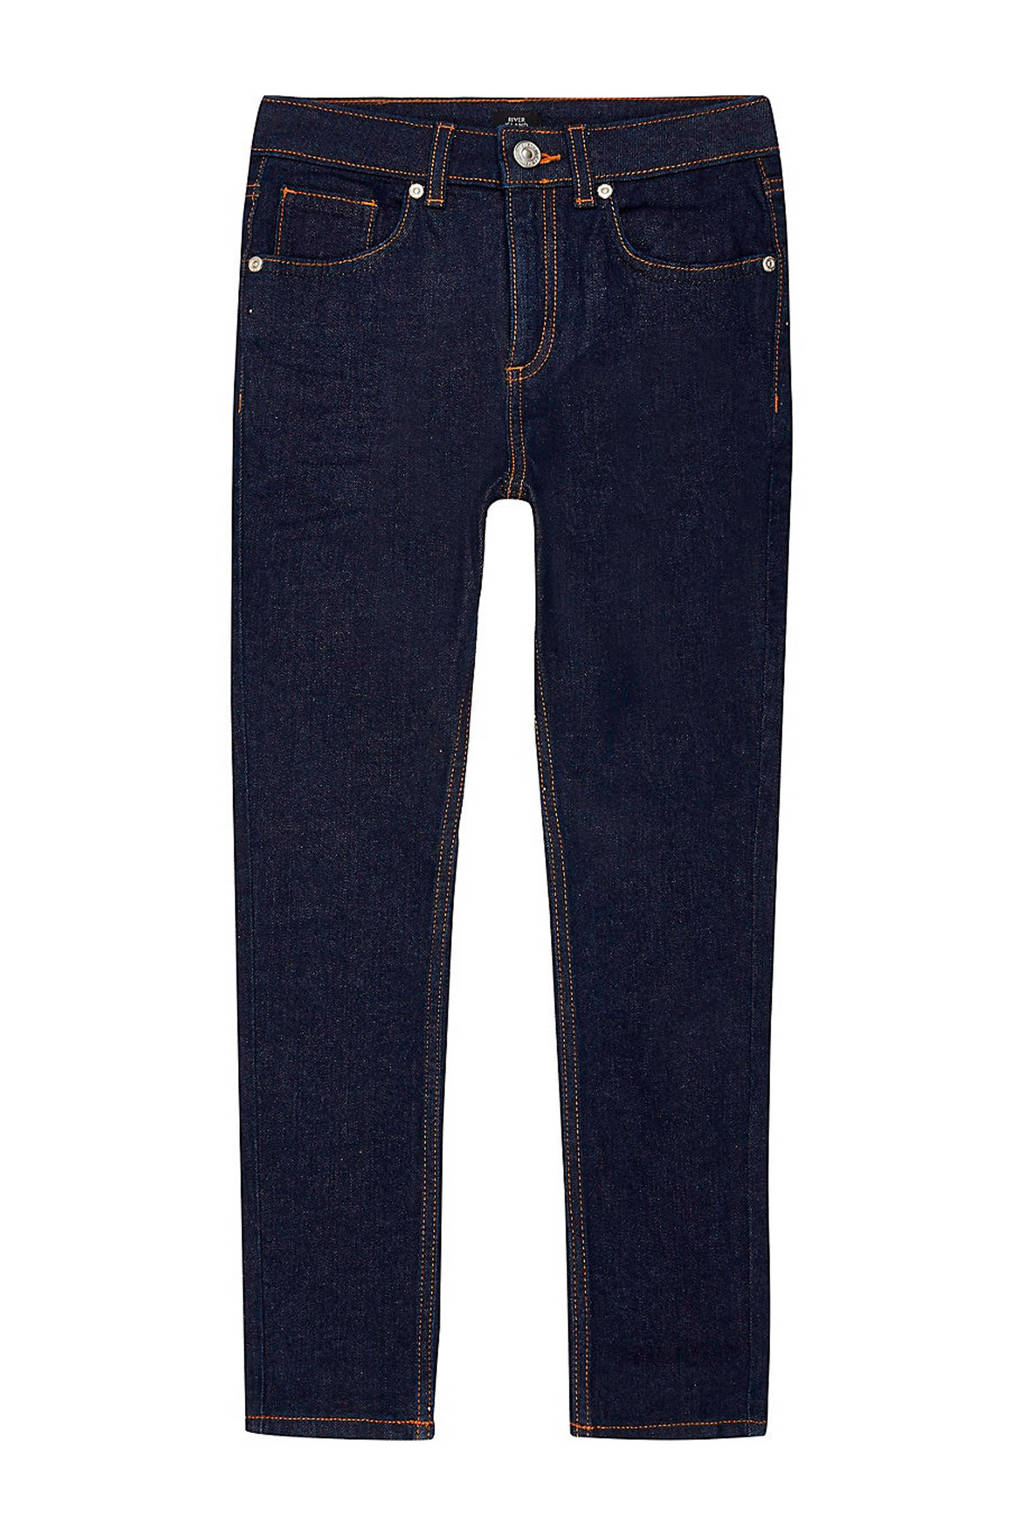 River Island skinny jeans donkerblauw, Donkerblauw